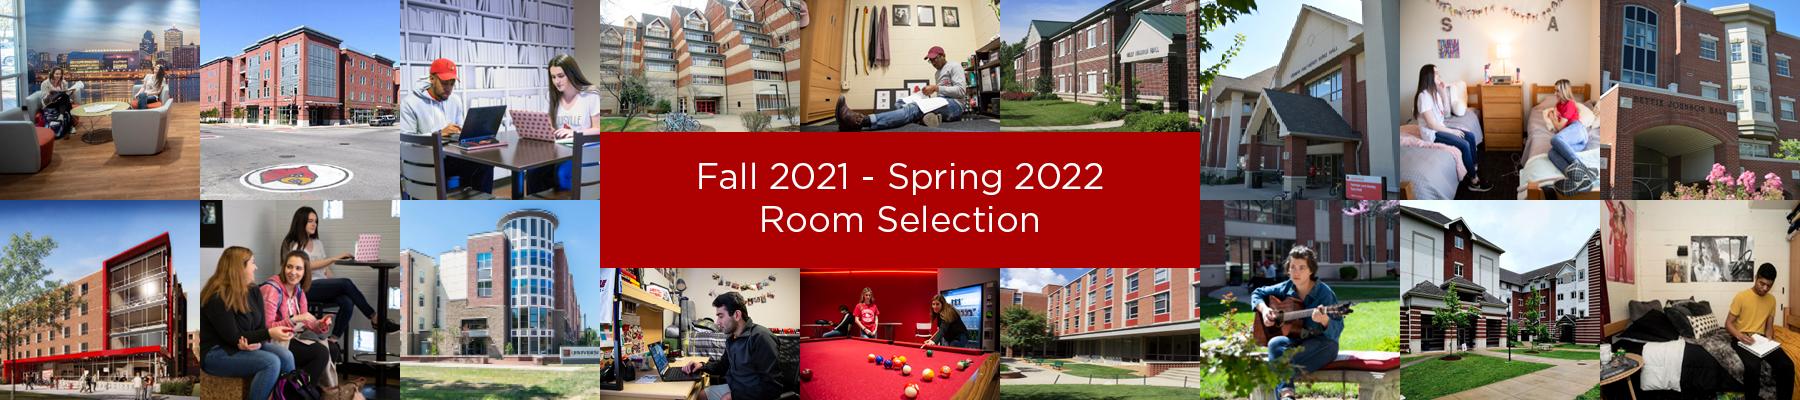 fall 2021 room selection